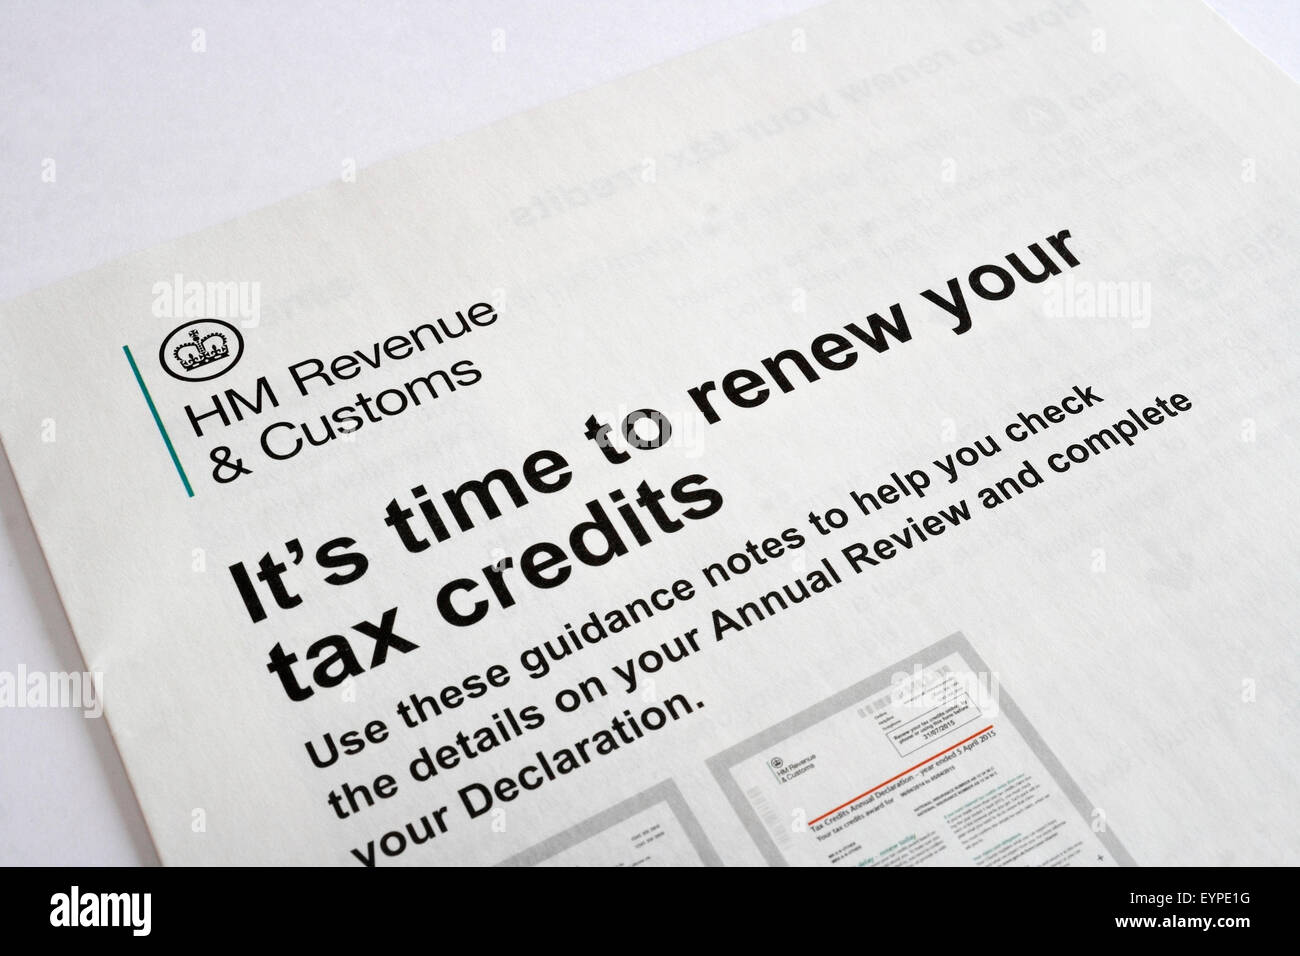 Tax Credits renew form UK Stock Photo, Royalty Free Image ...